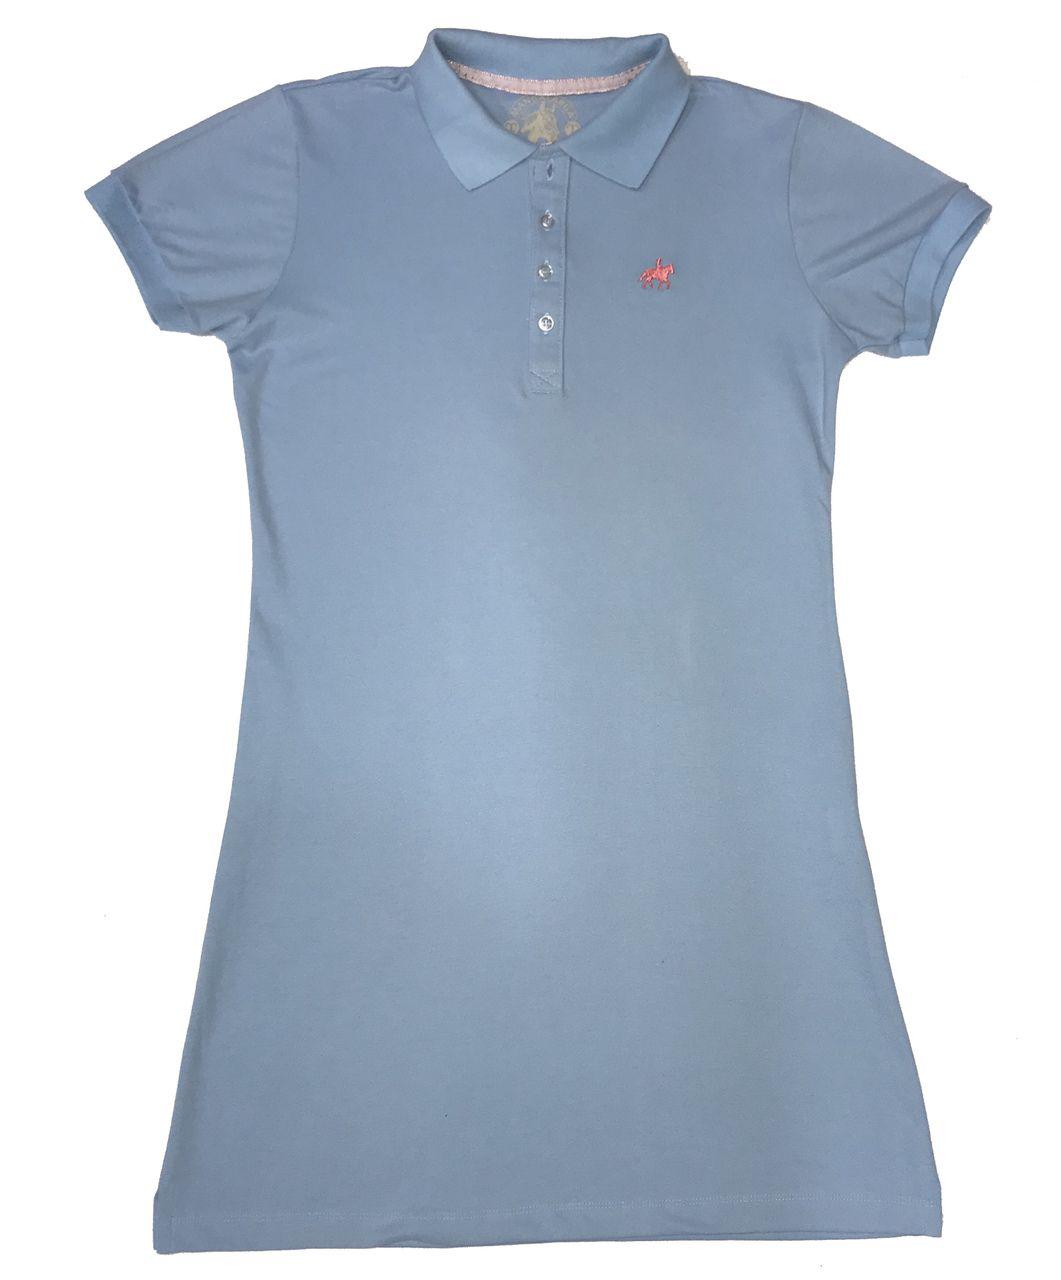 Vestido Polo Feminino  - Boutique Mangalarga